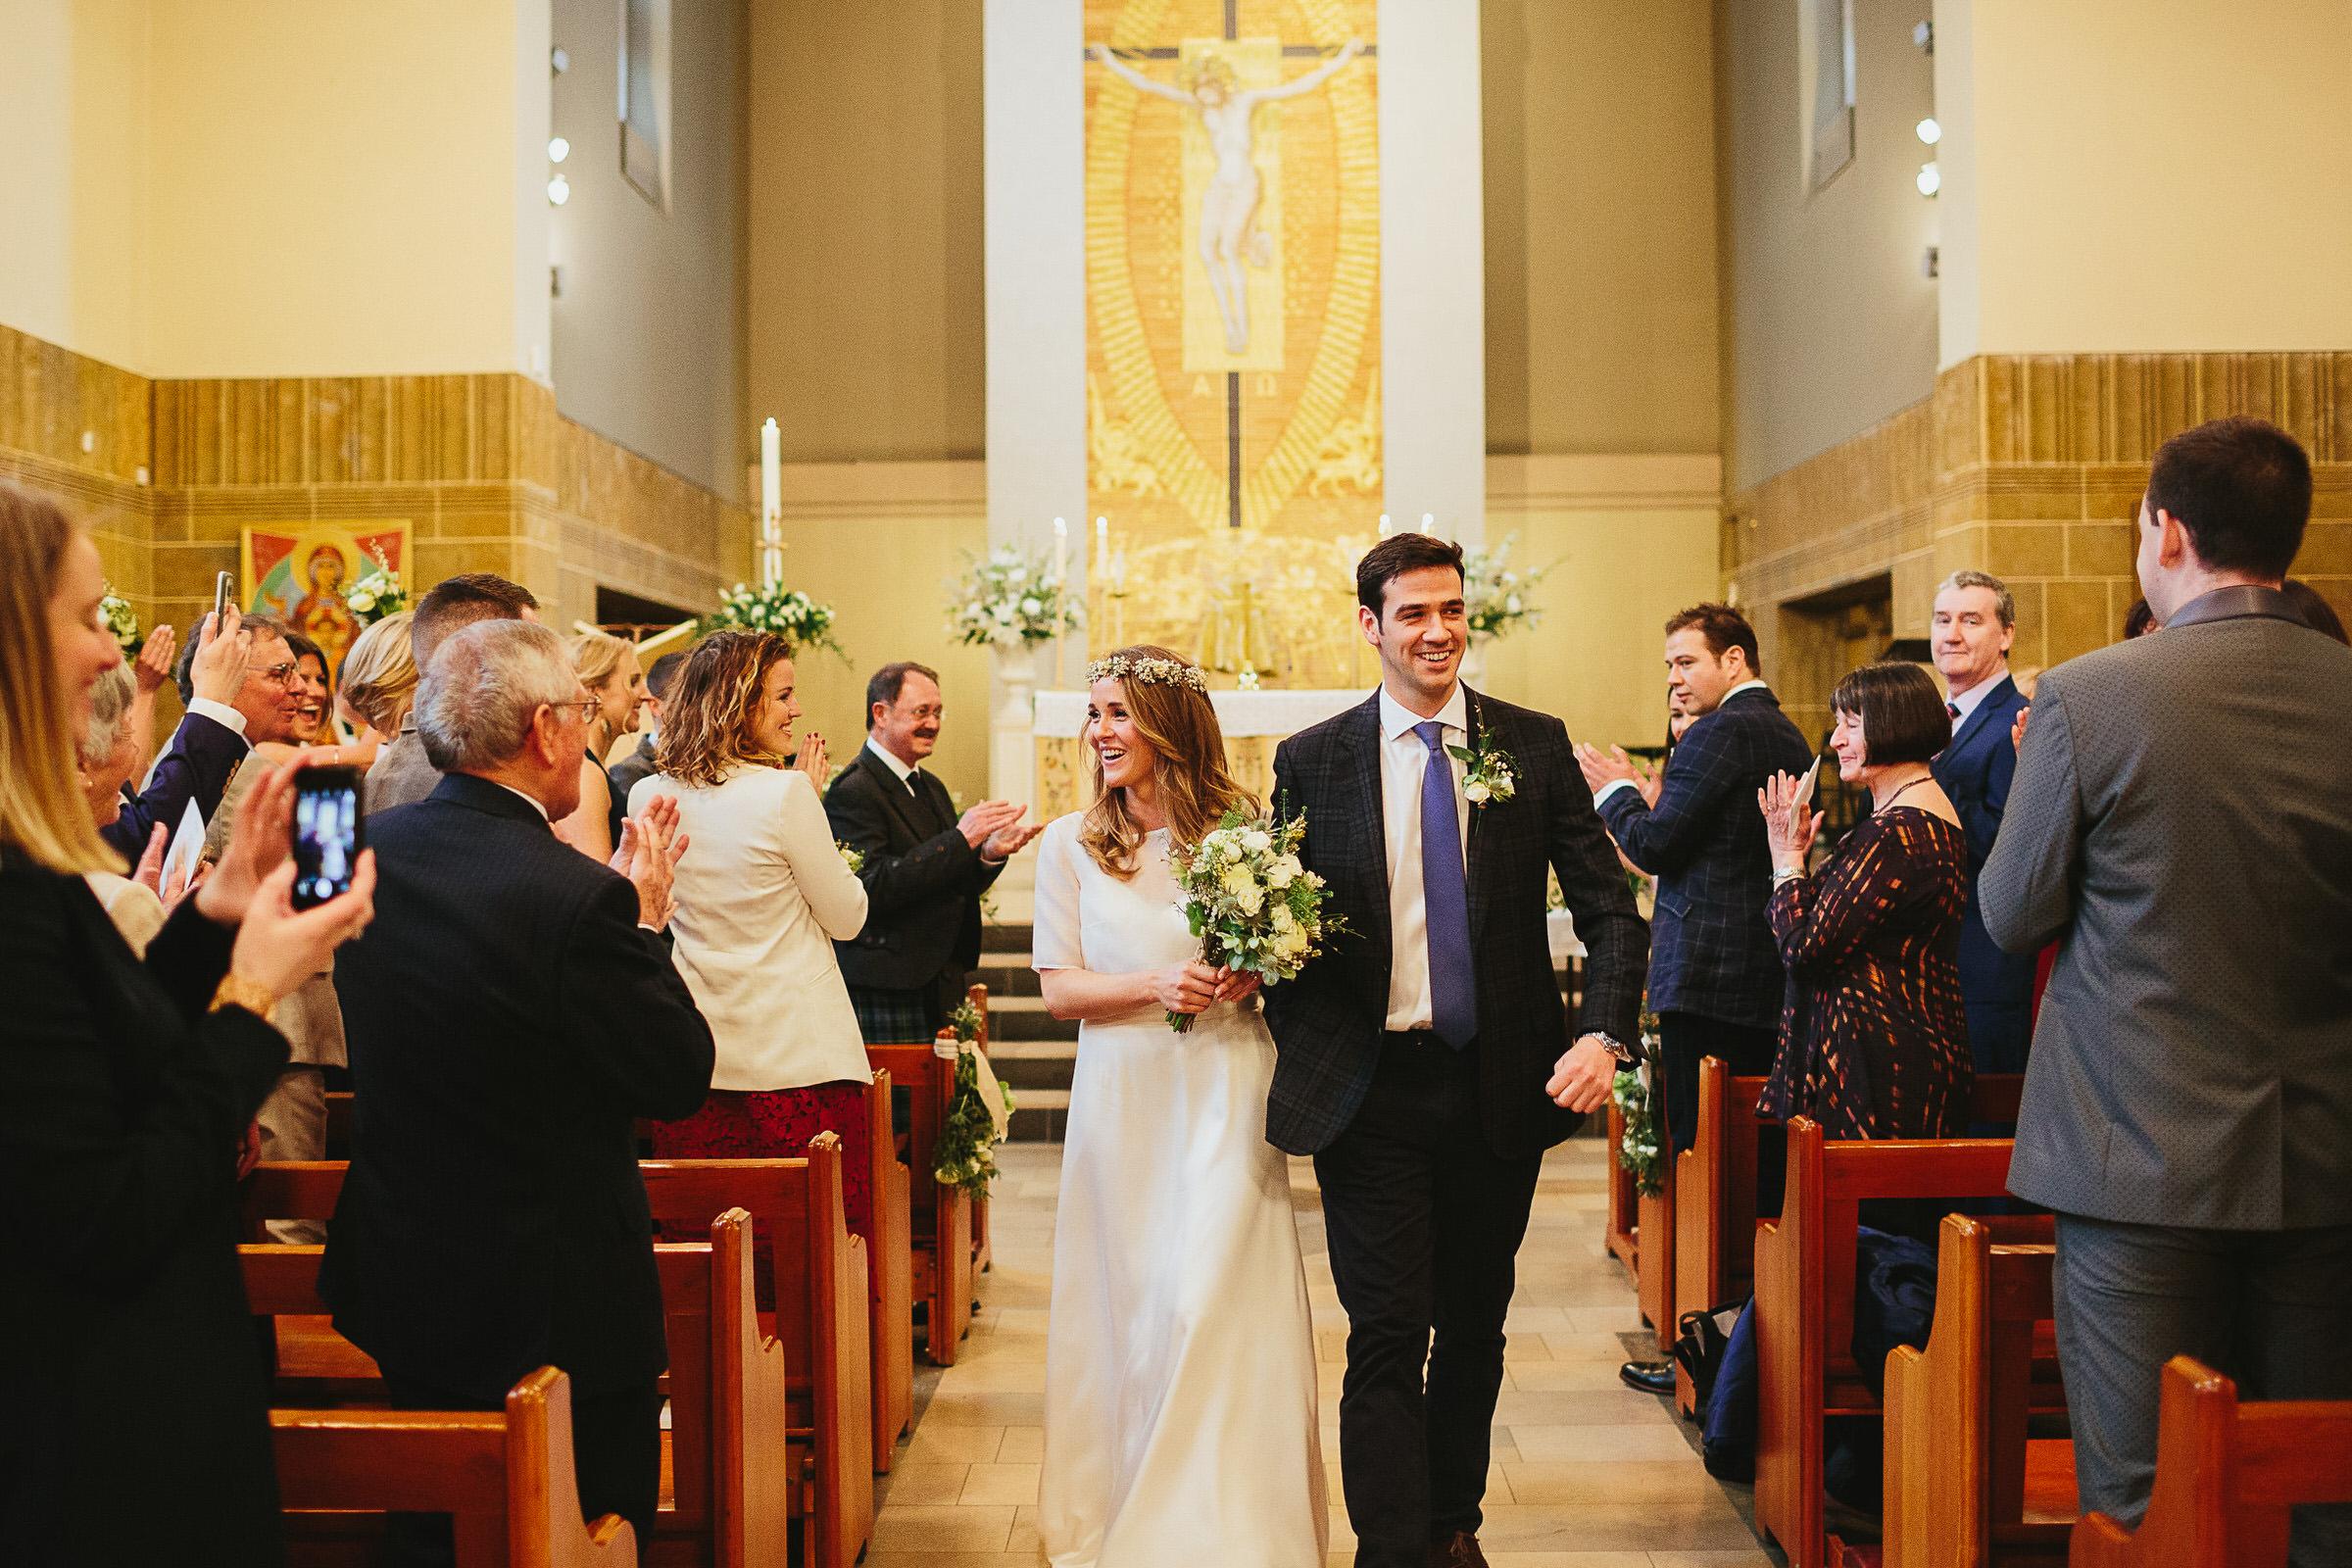 The Elgin Pub wedding - Eamonn & Fiona